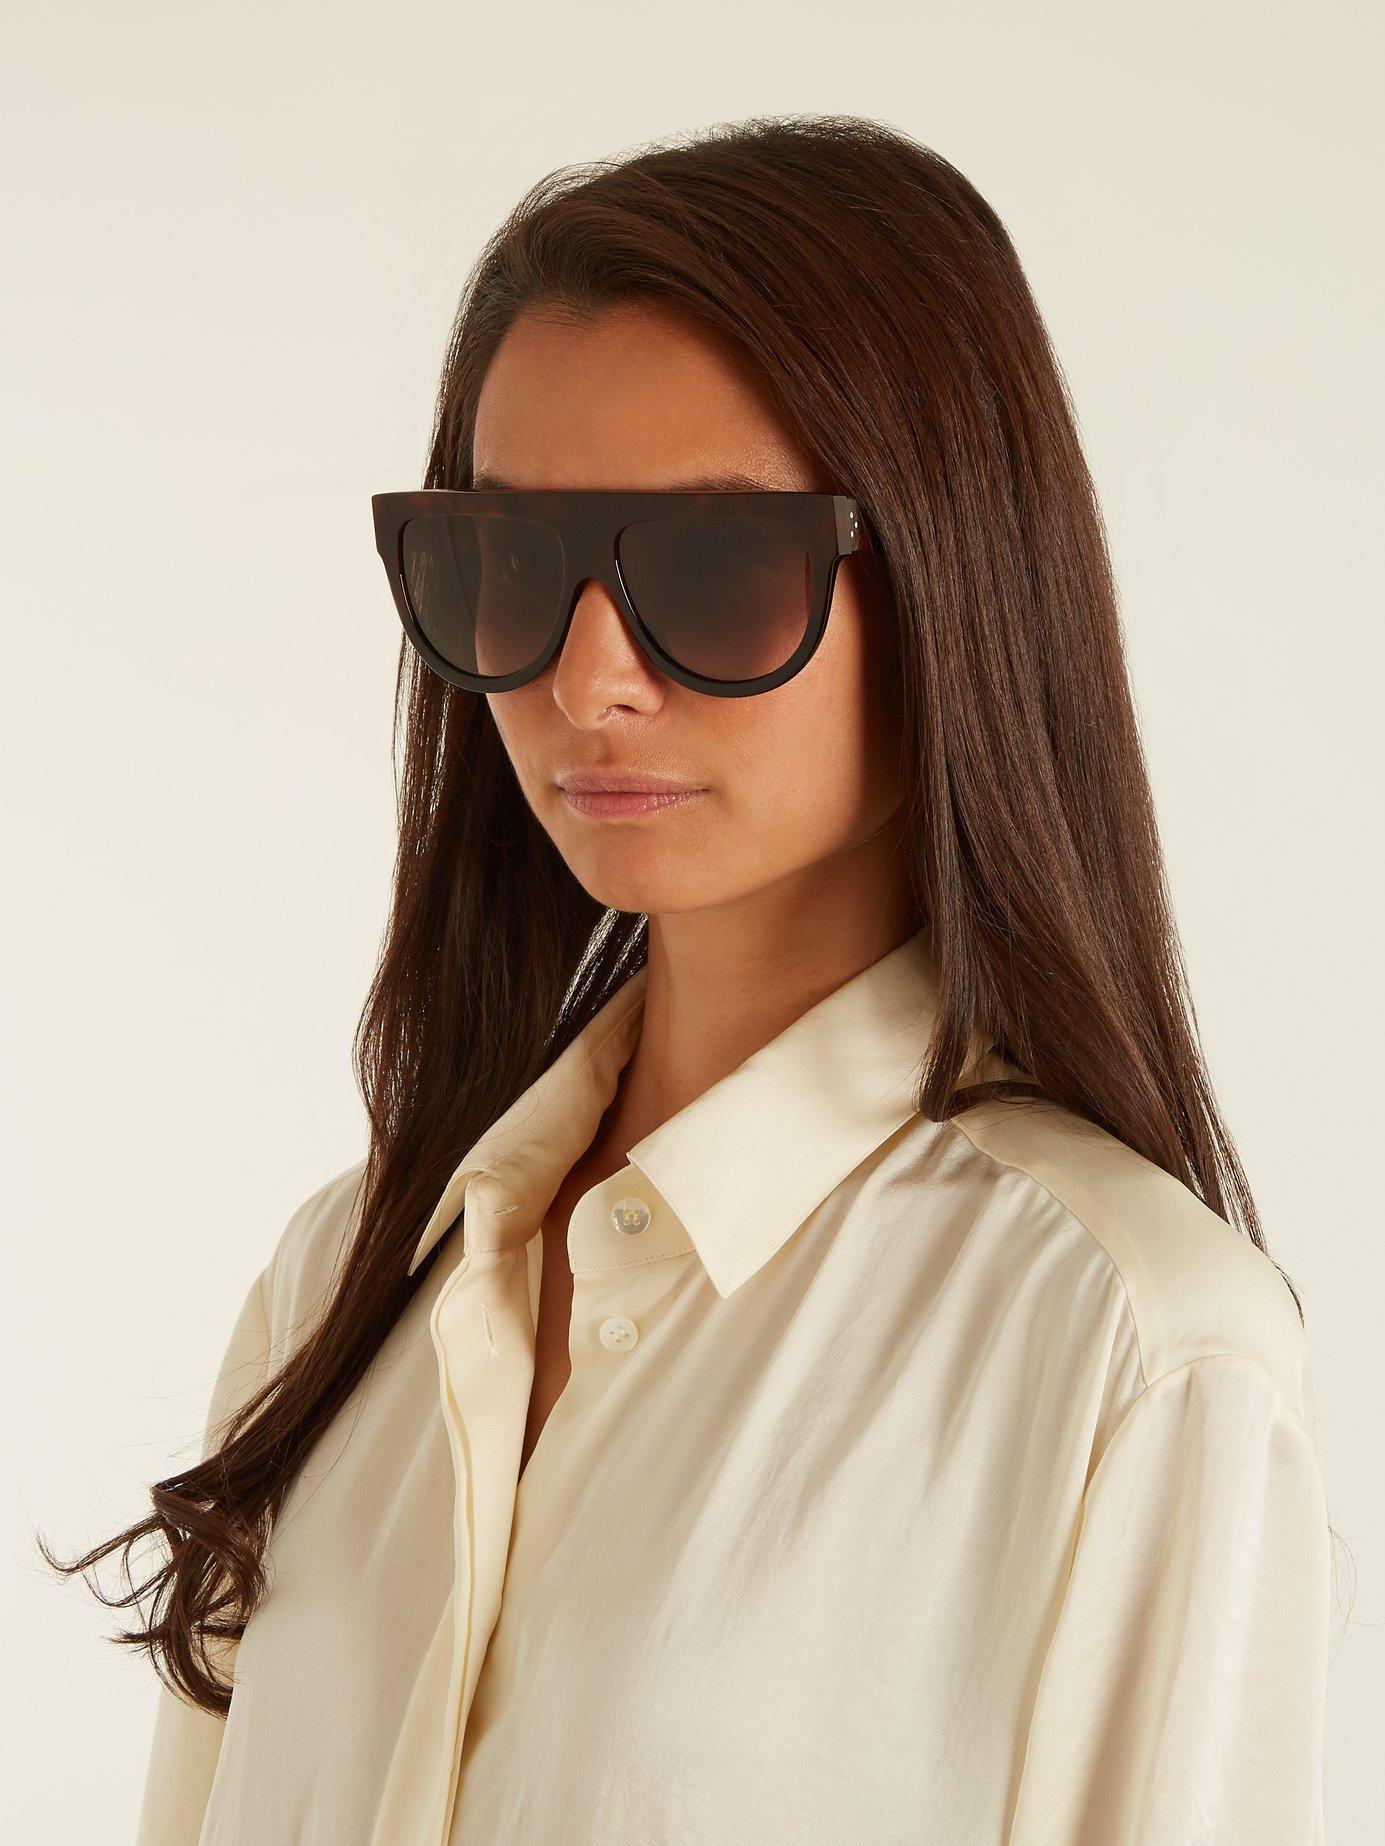 48d5cb79ae37 Lyst - Céline Shadow D Frame Acetate Sunglasses in Brown - Save 3%